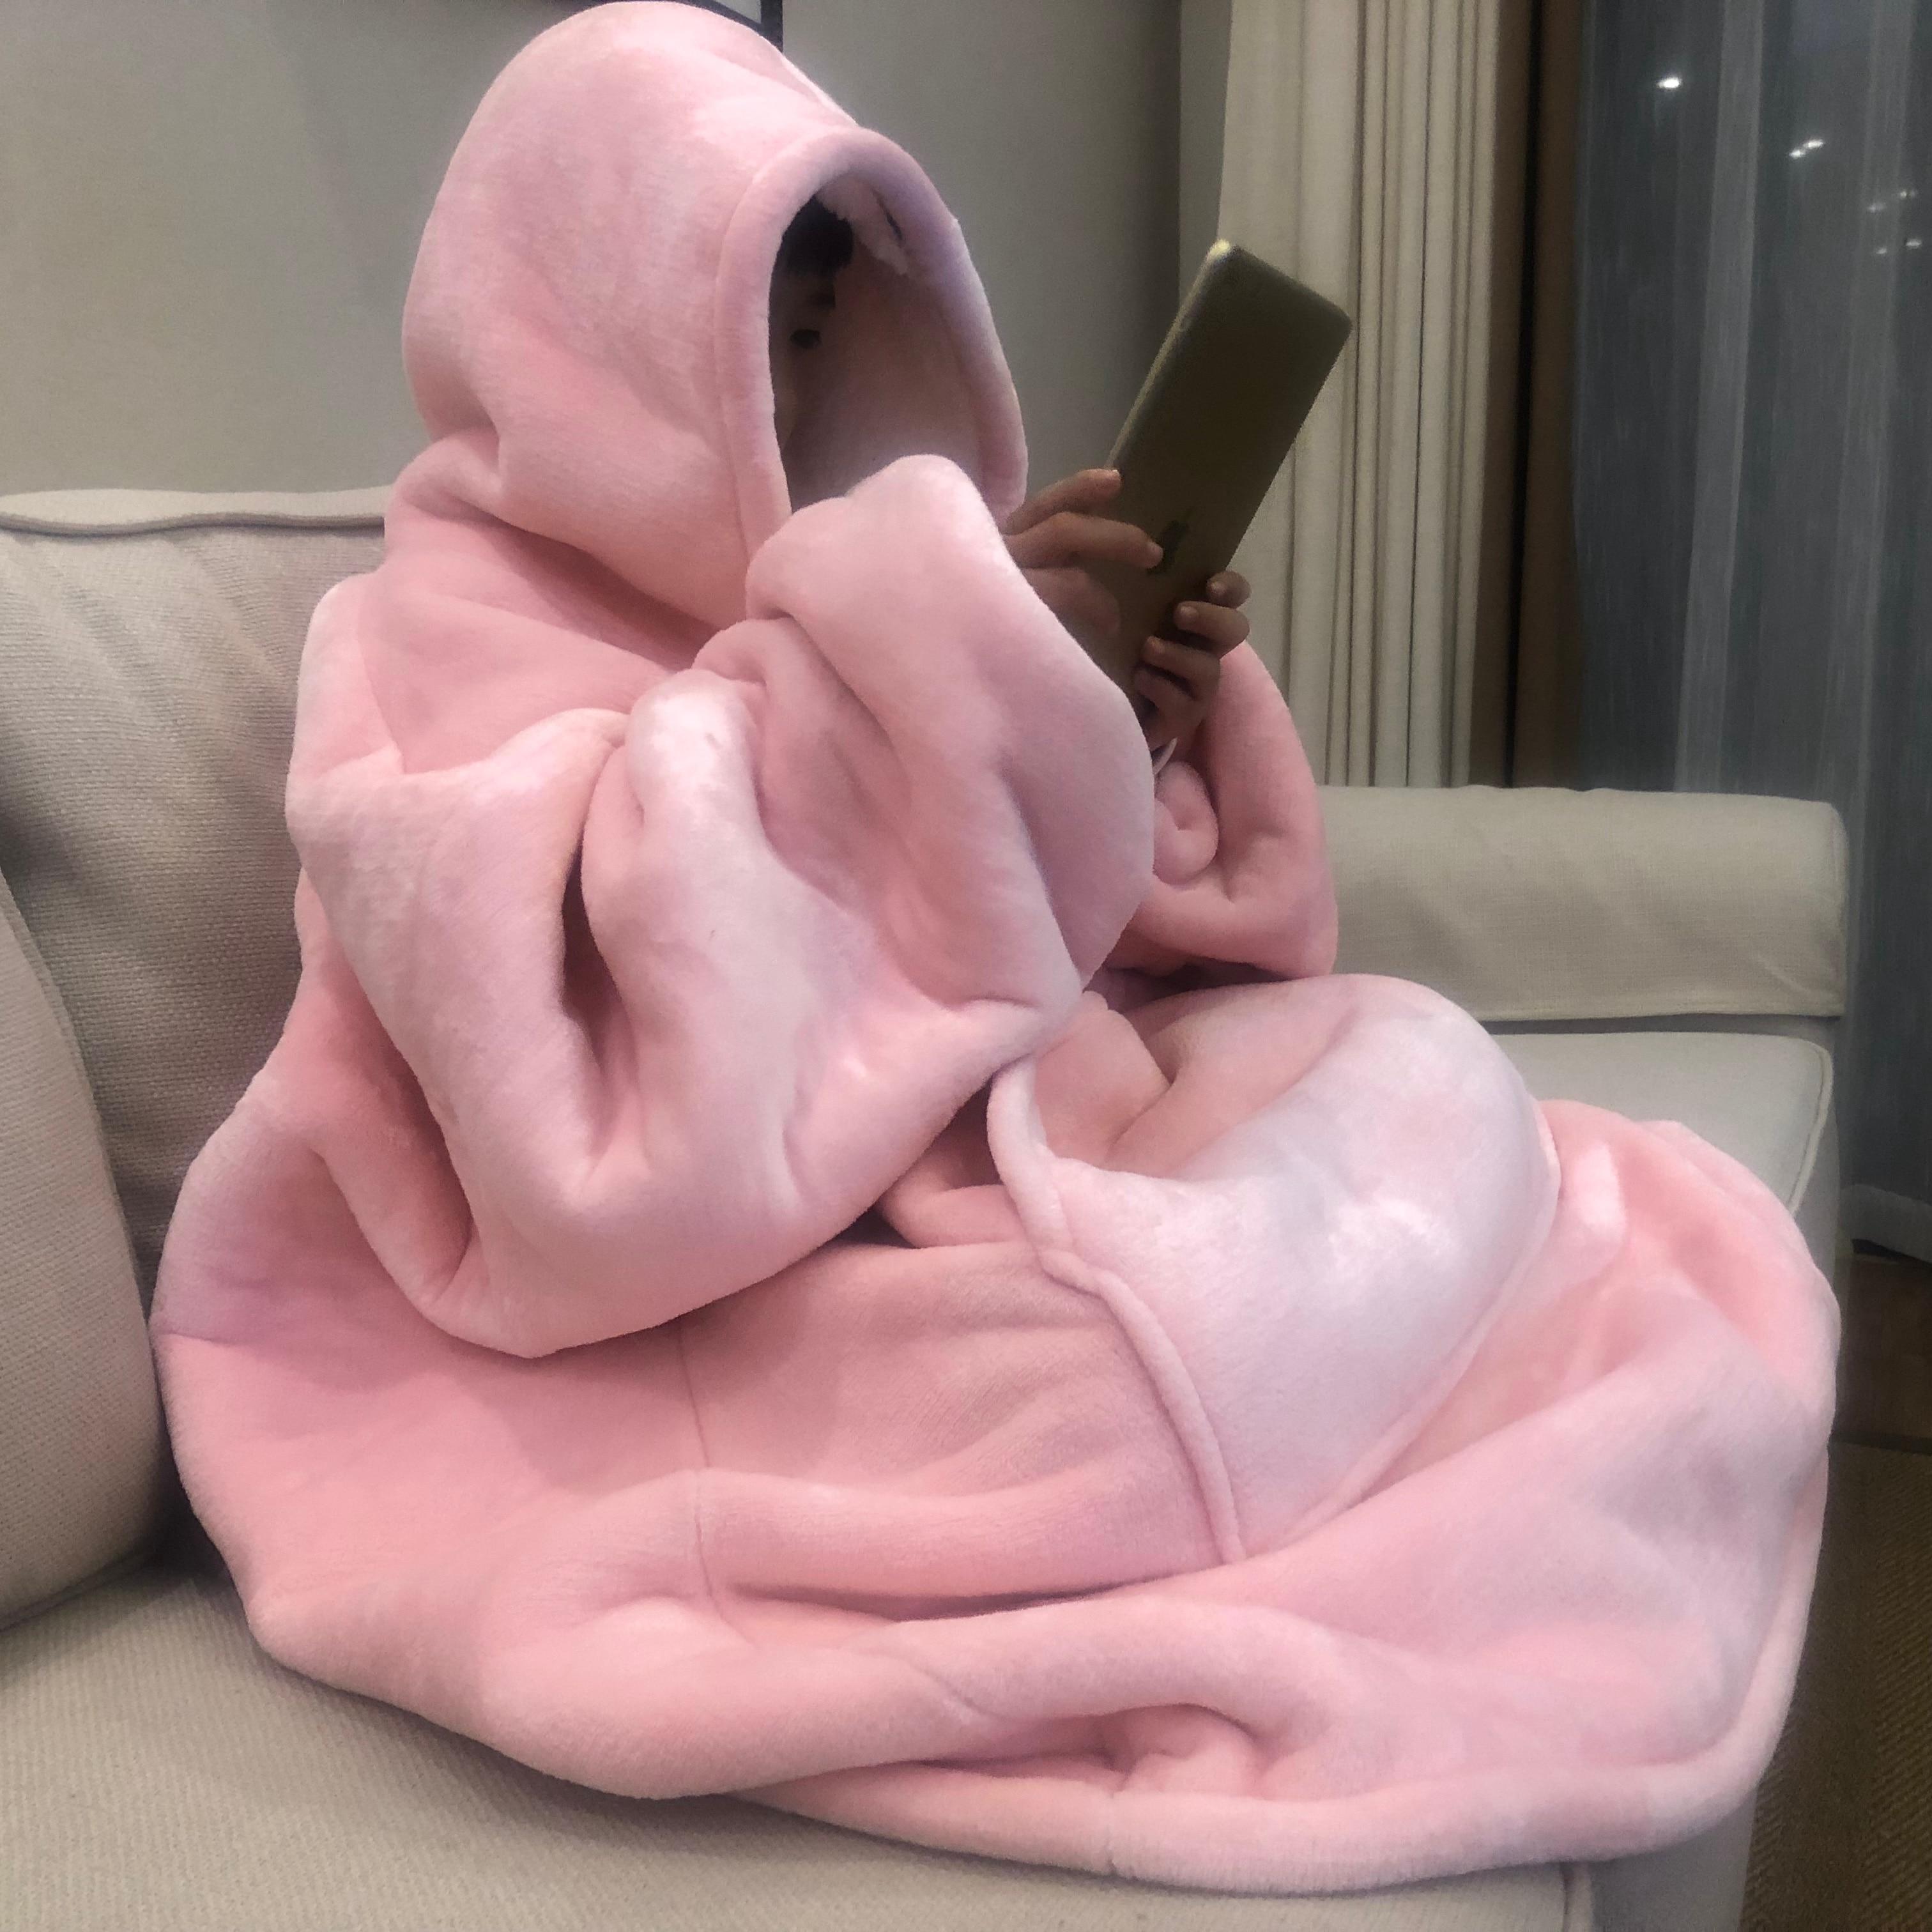 Permalink to Winter Oversized Hoodies Women Fleece Warm TV Blanket with Sleeves Pocket Flannel Plush Thick Sherpa Giant Hoody Long Sweatshirt